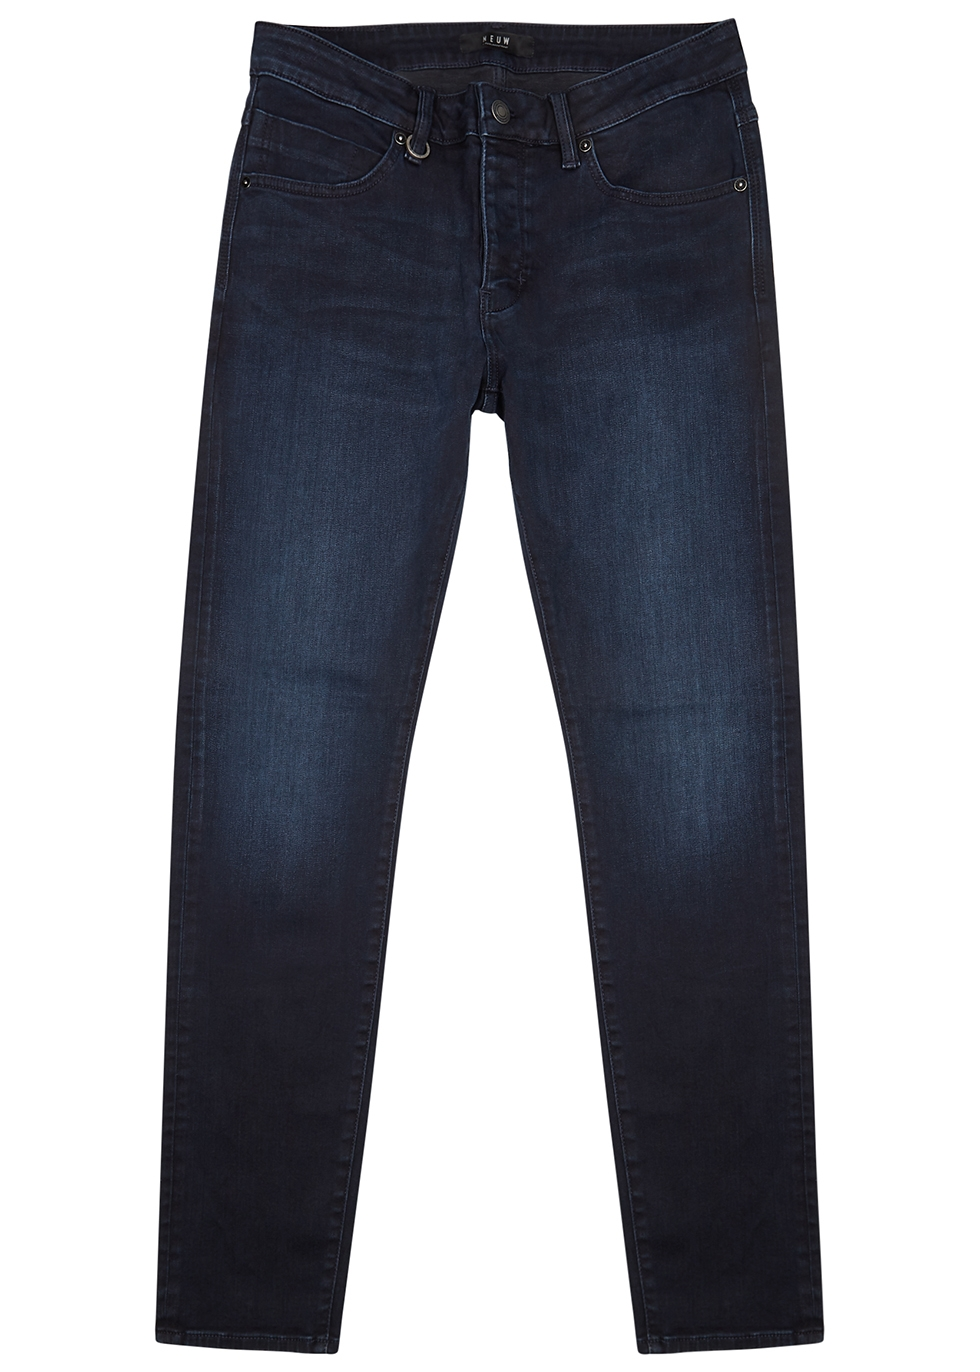 Iggy dark blue skinny jeans